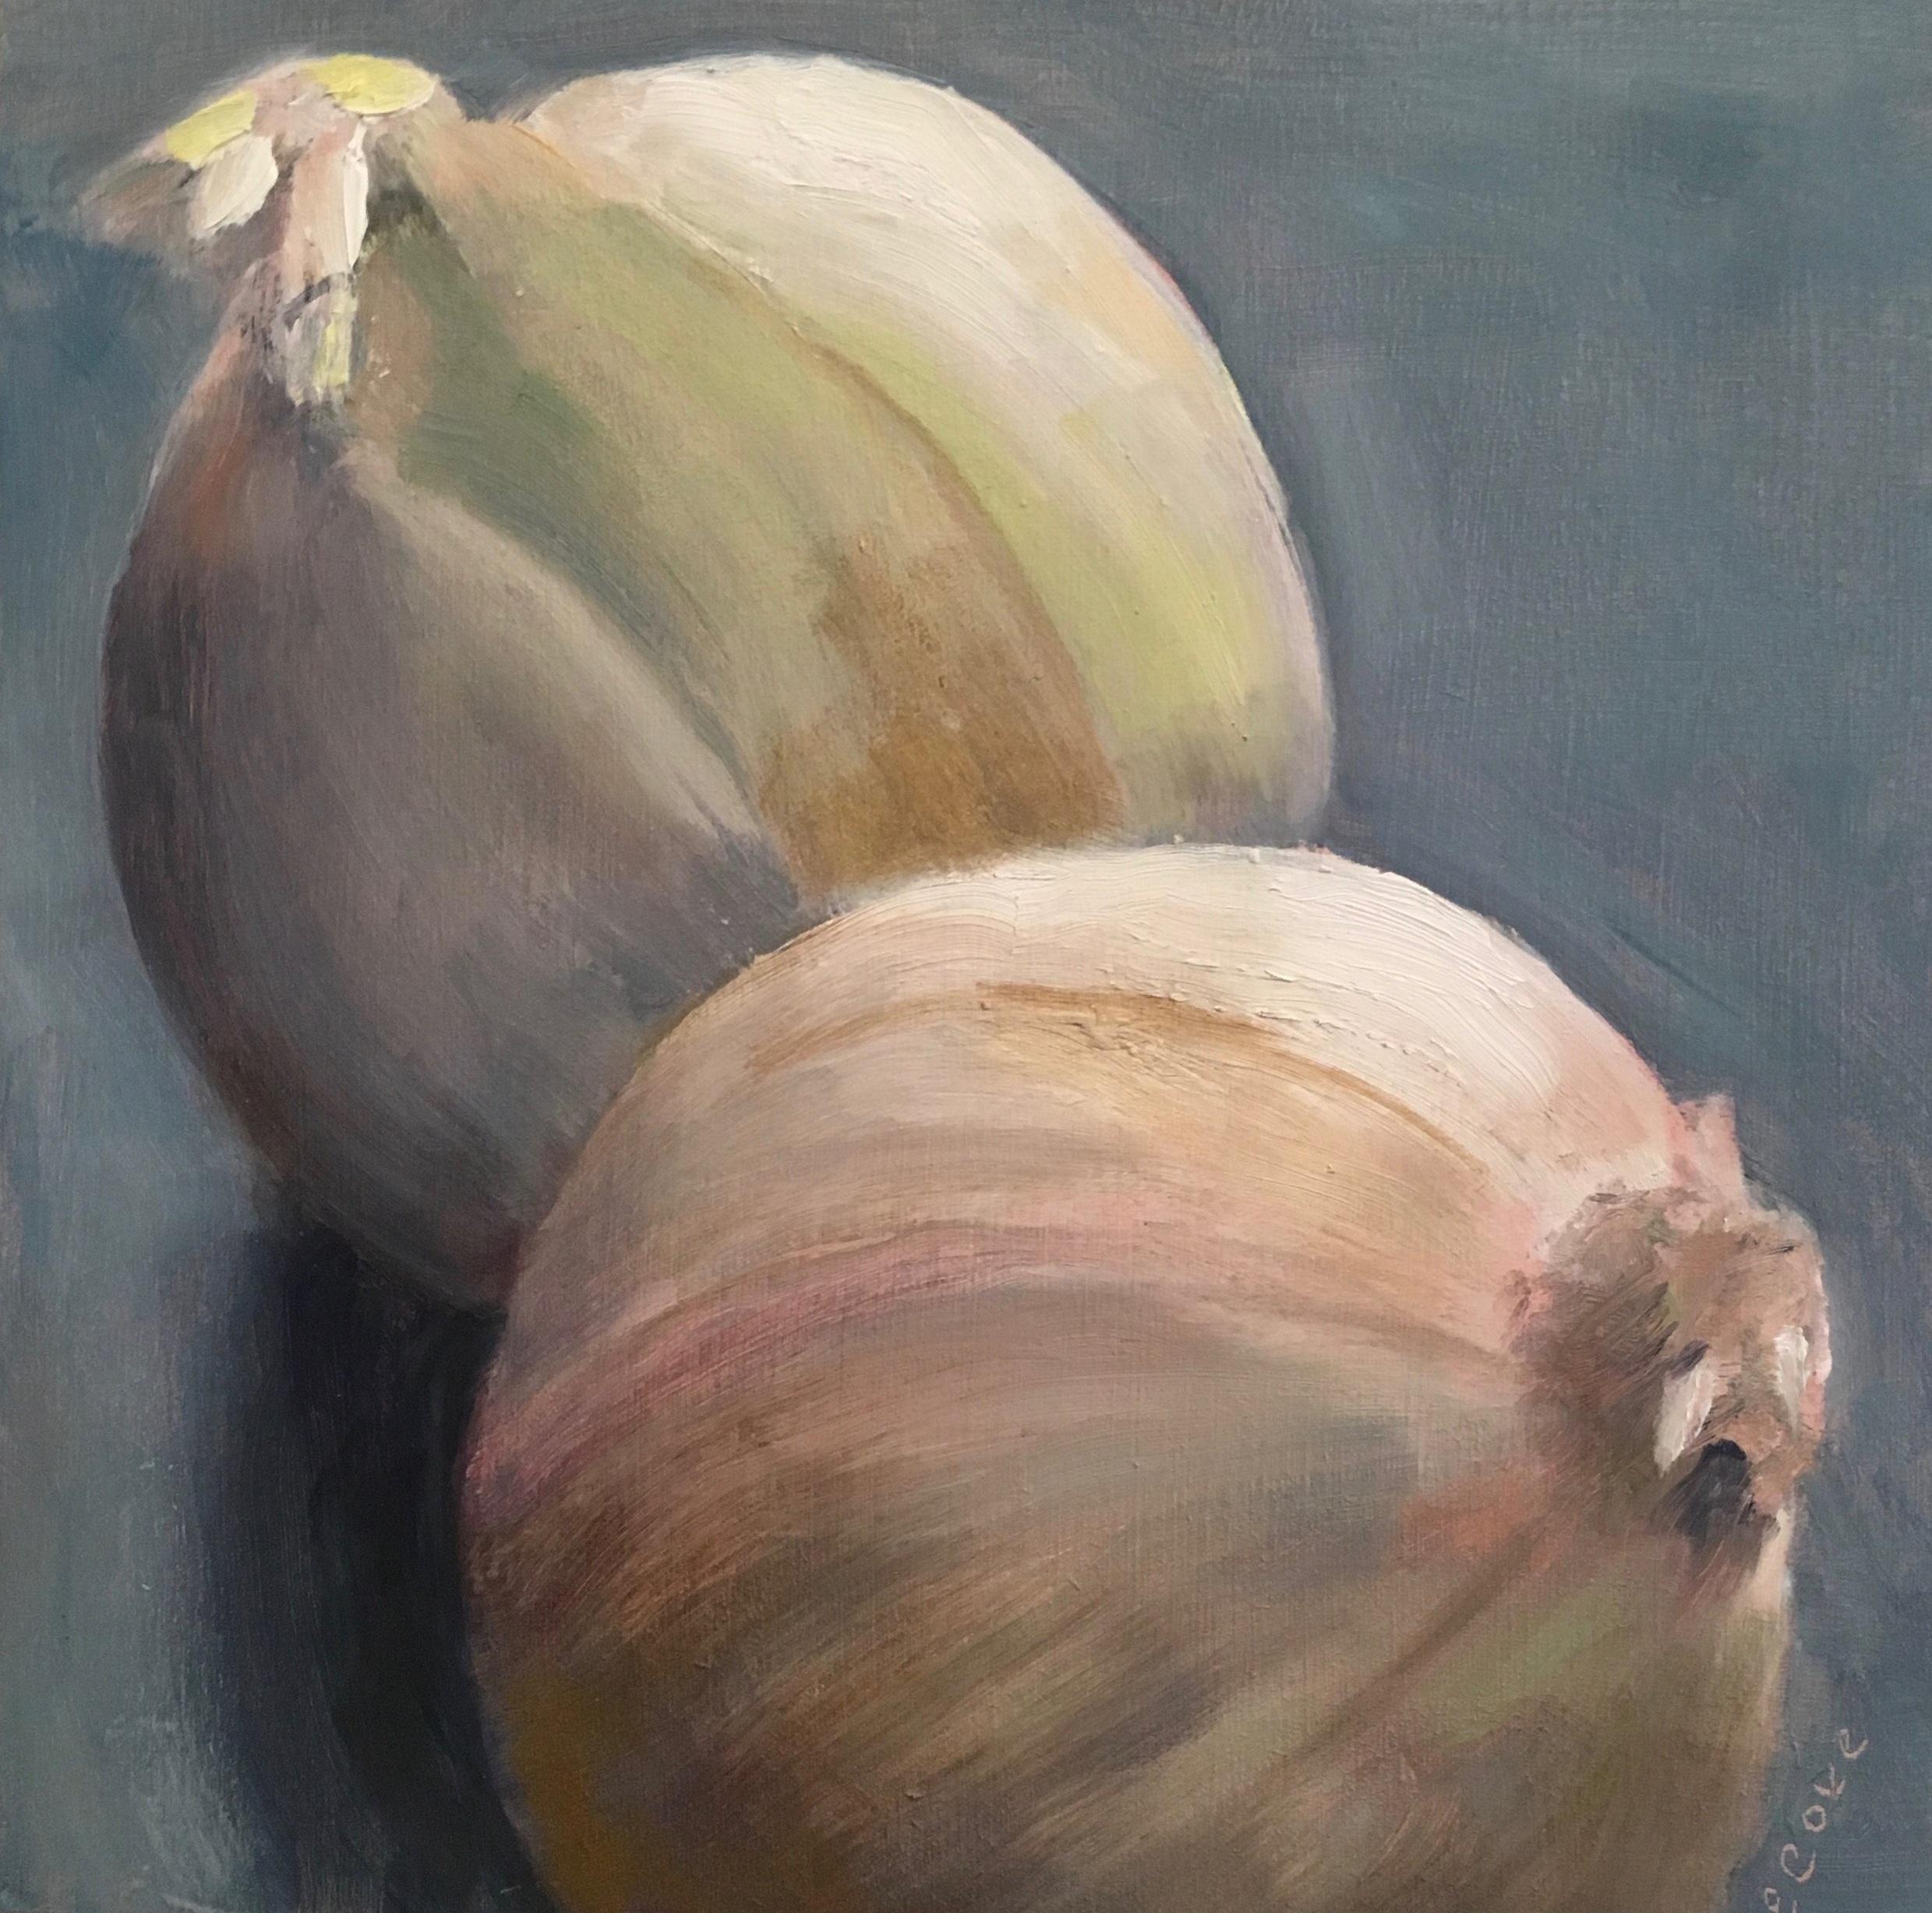 Two White Onions